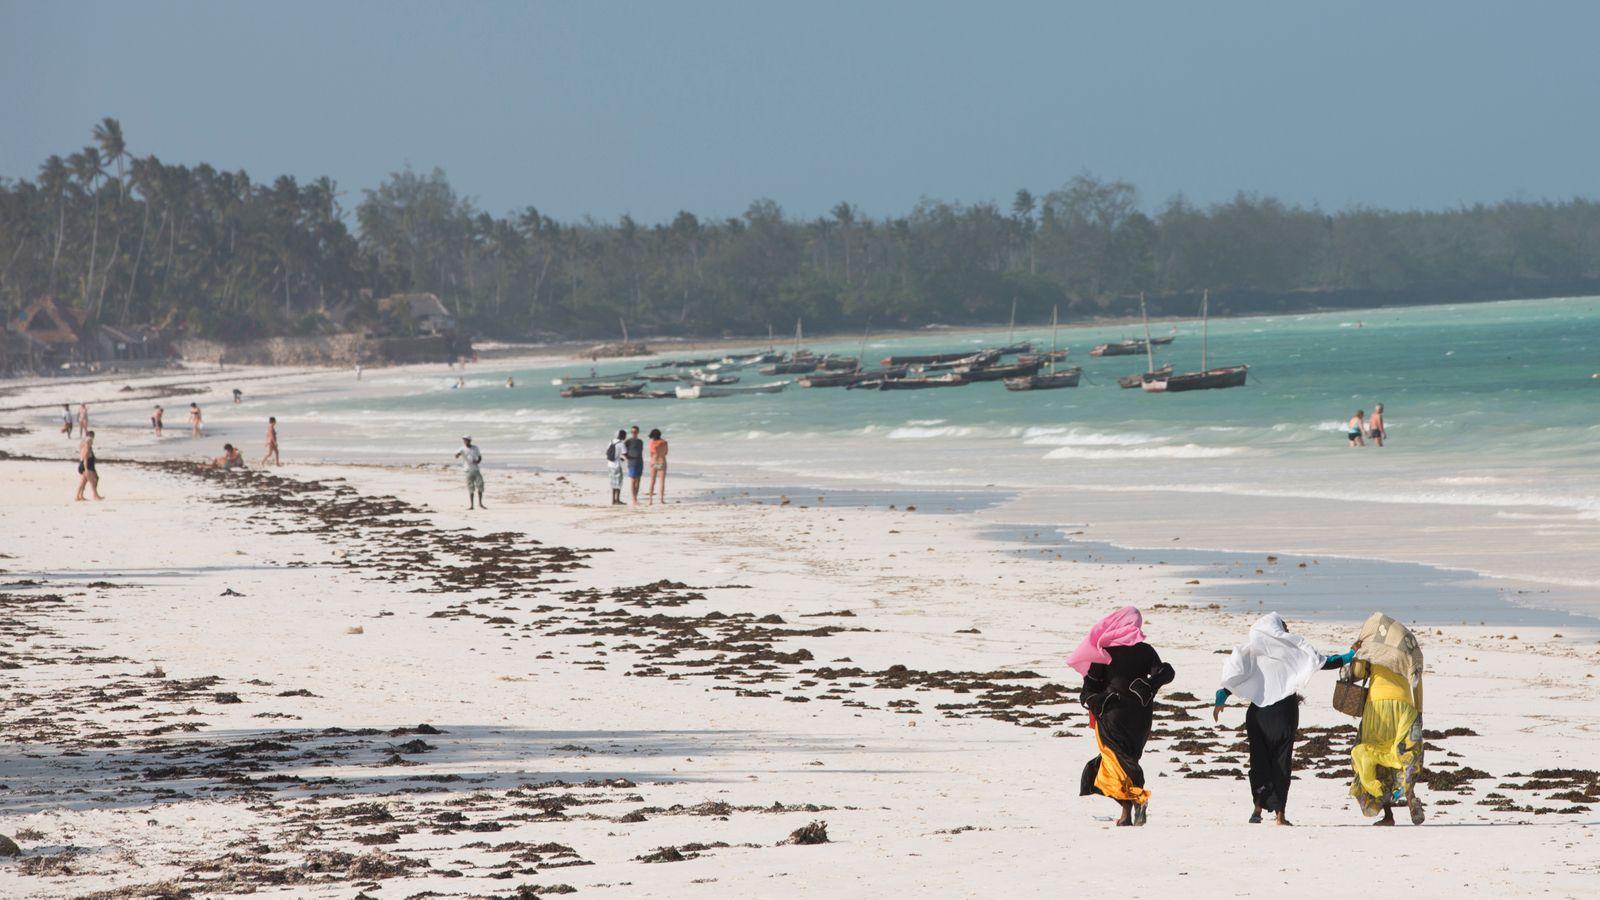 Zanzibar tourism